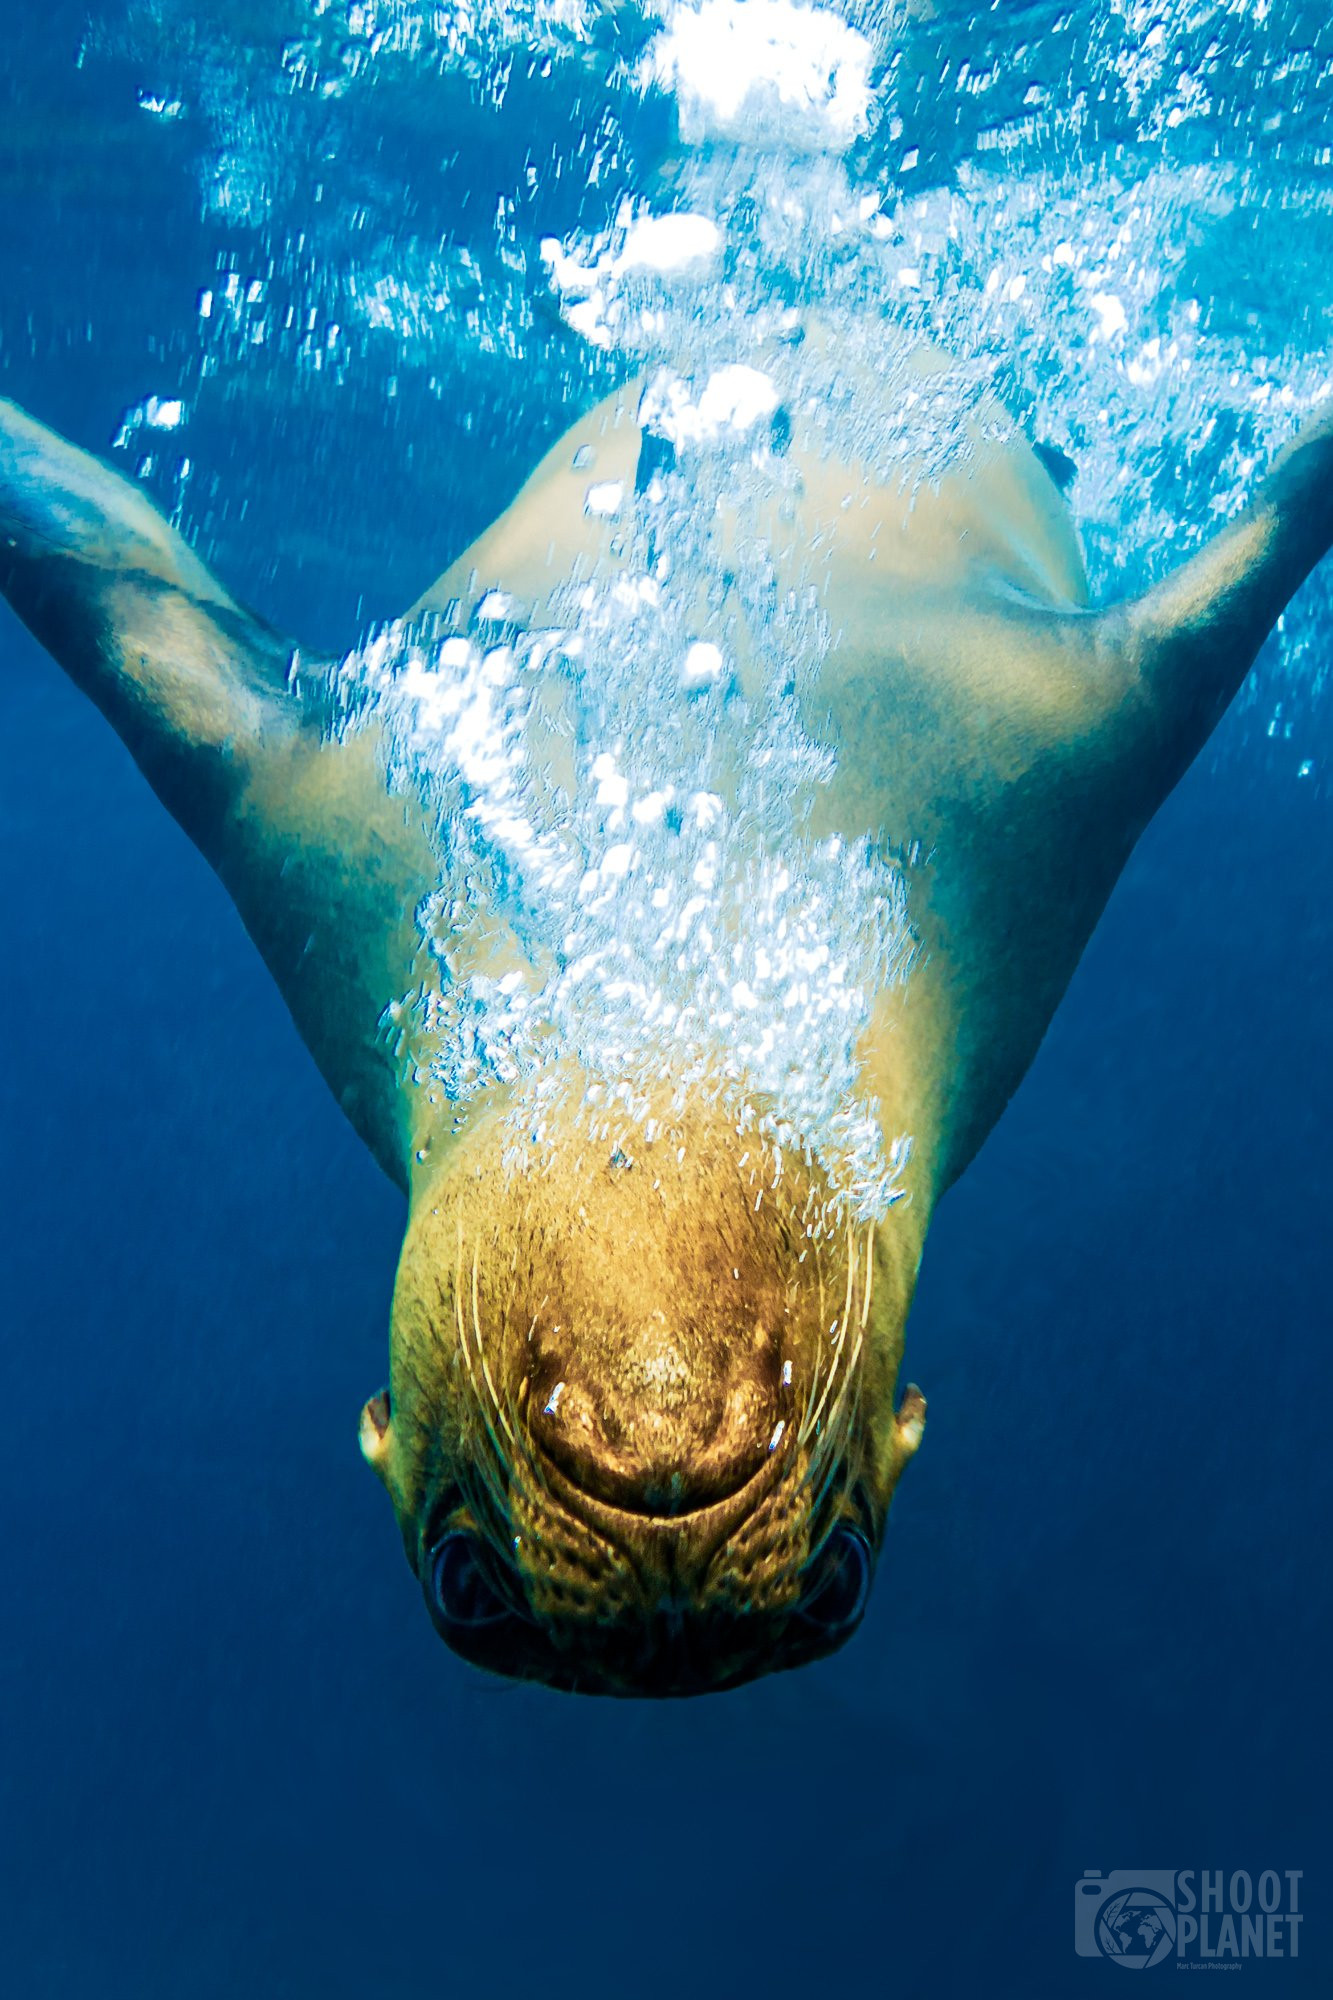 Lion seal underwater, Galapagos Islands